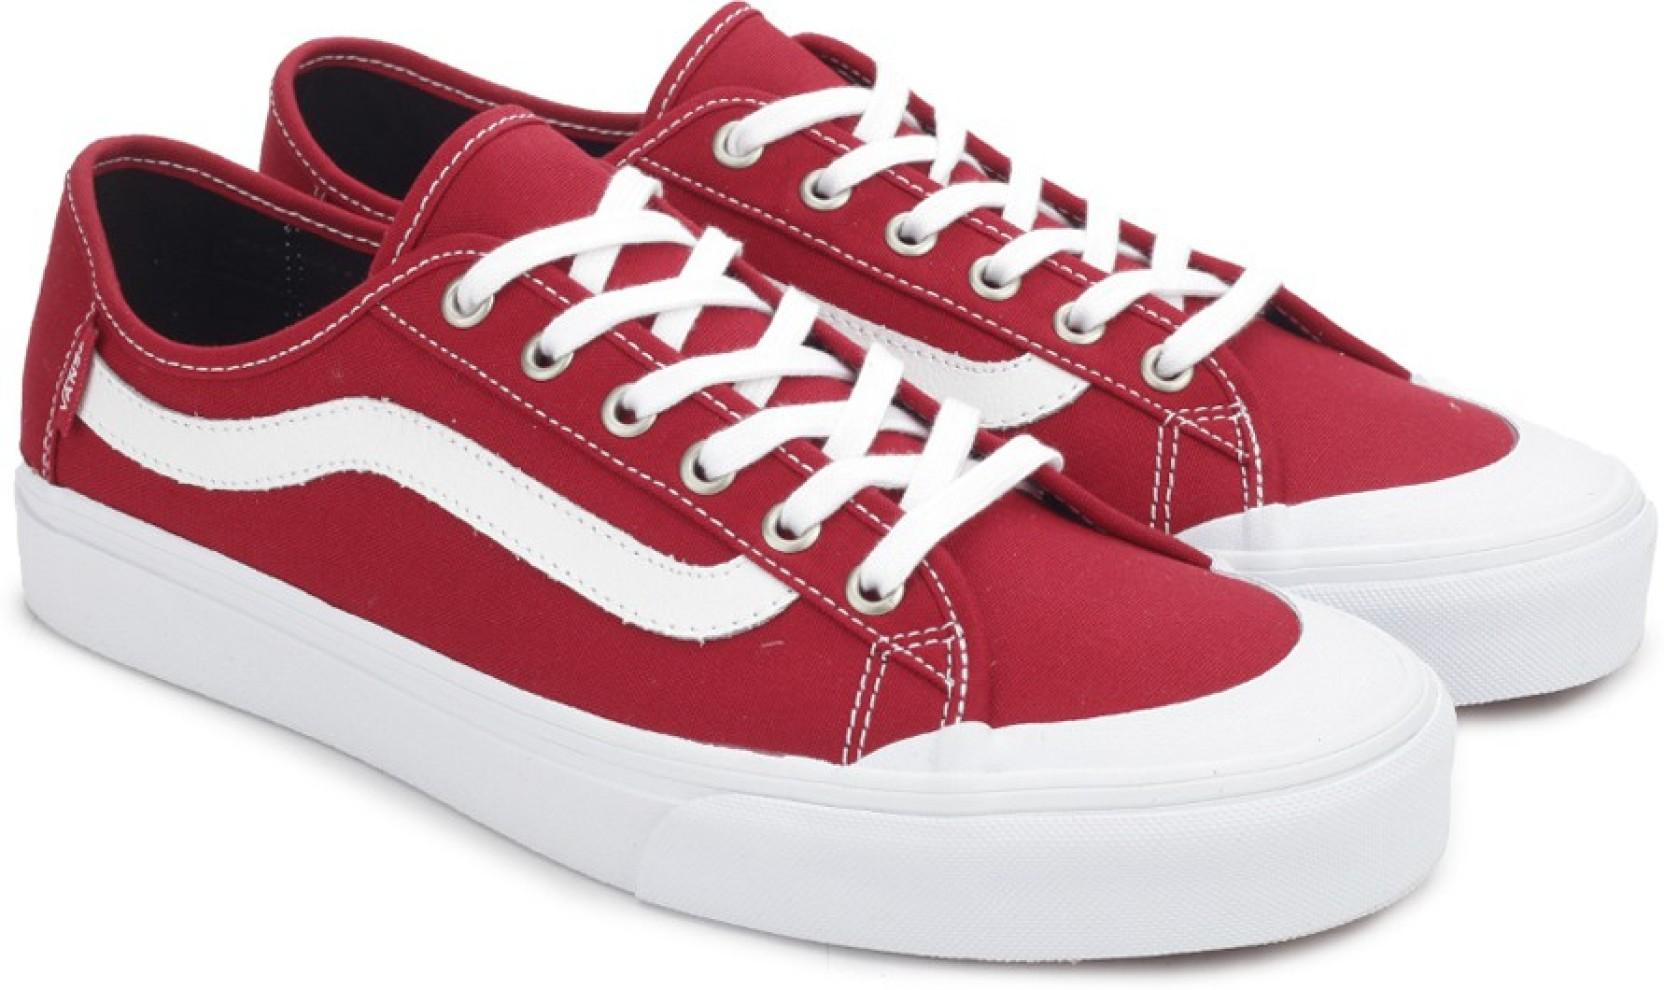 Vans BLACK BALL SF Sneakers For Men - Buy CHILI PEPPER Color Vans ... 74a111338